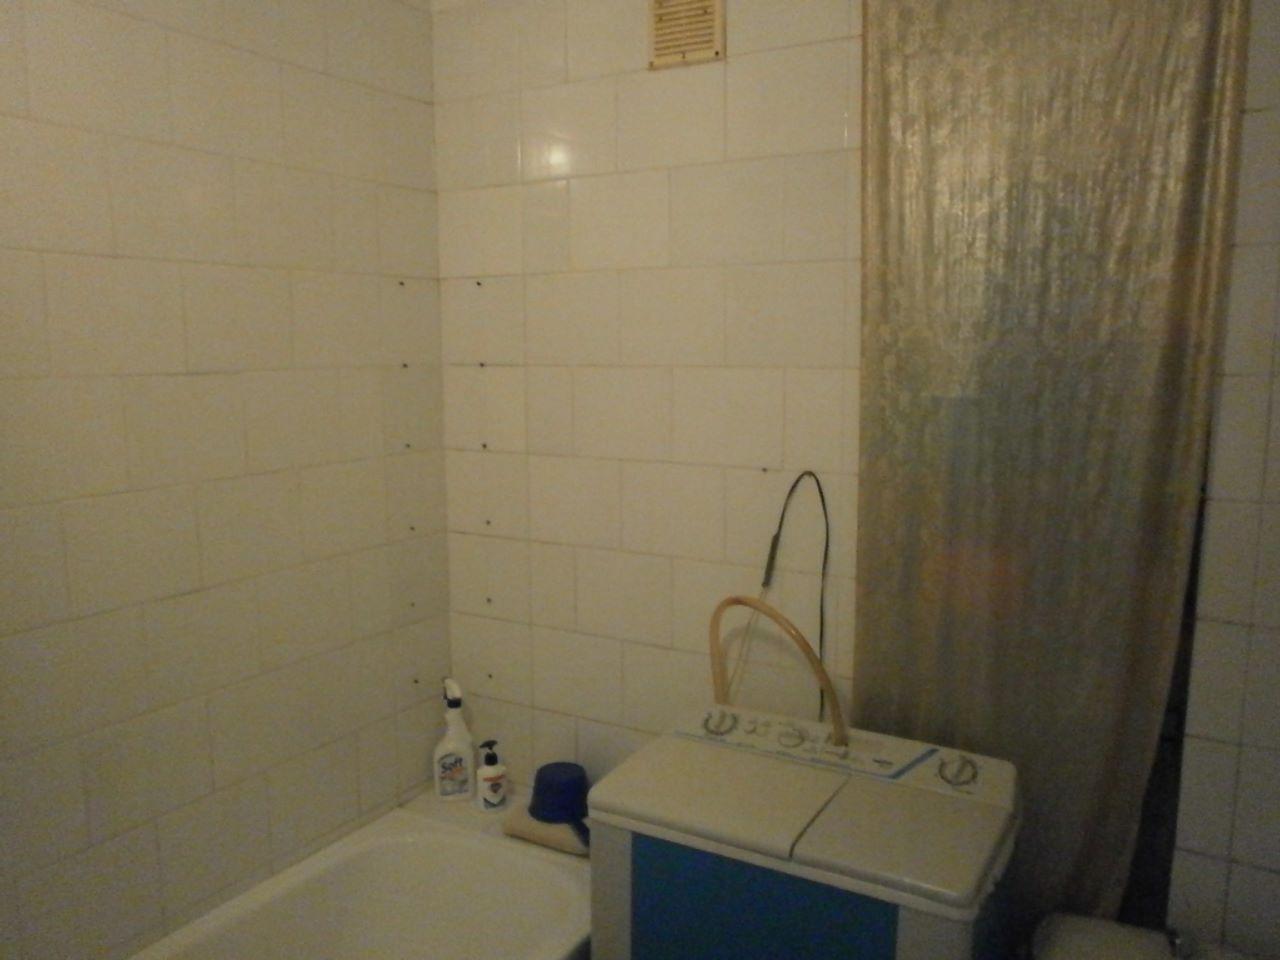 Продается 1-комнатная квартира на ул. Парковая — 36 000 у.е. (фото №6)